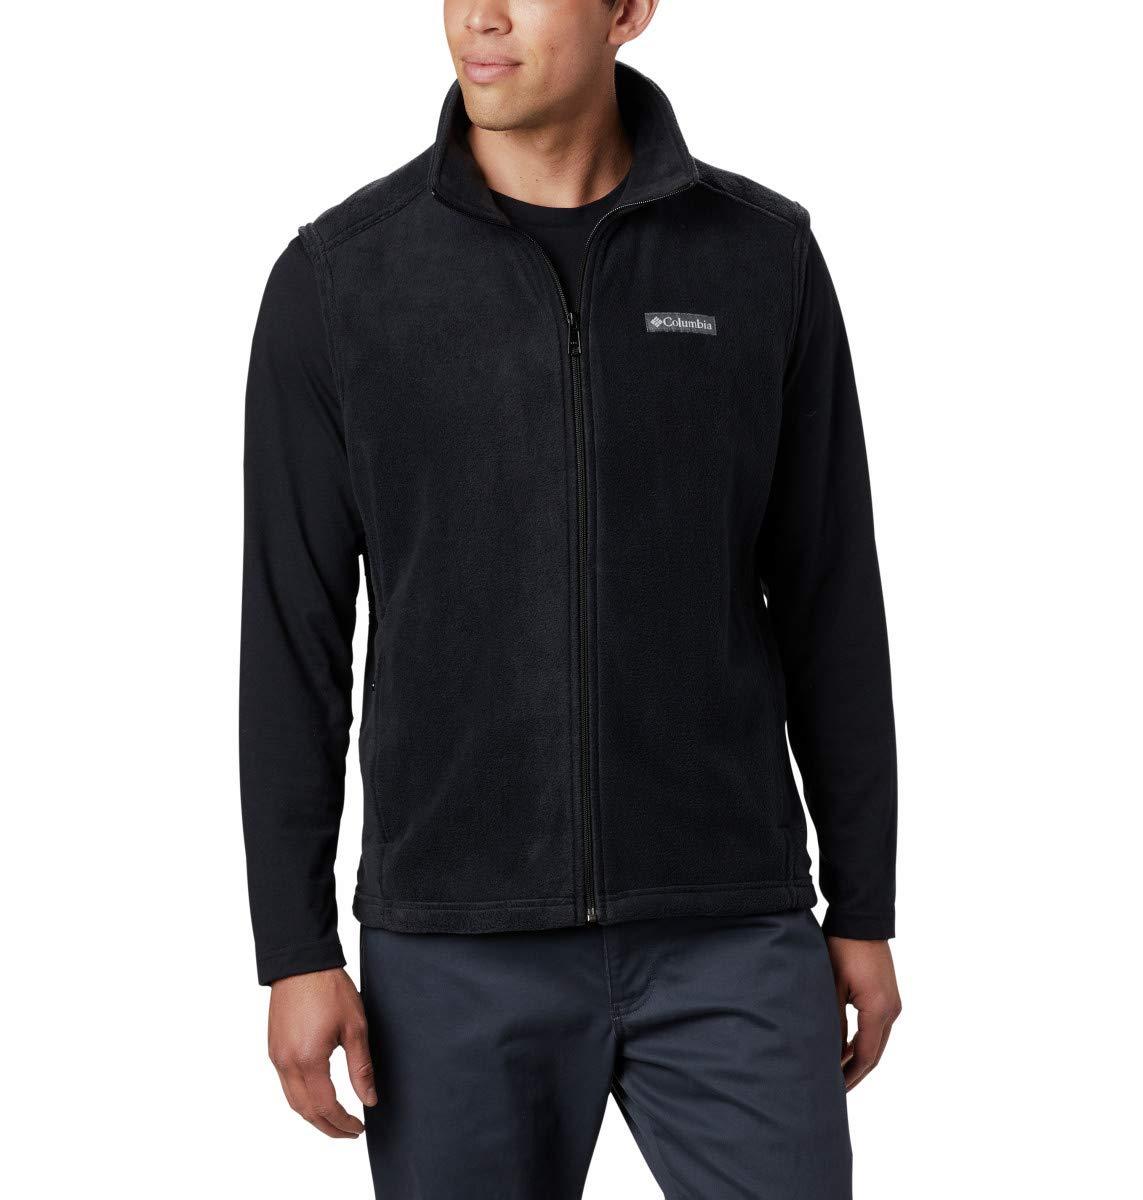 Columbia Men's Steens Mountain Full Zip Soft Fleece Vest, Black, XX-Large by Columbia